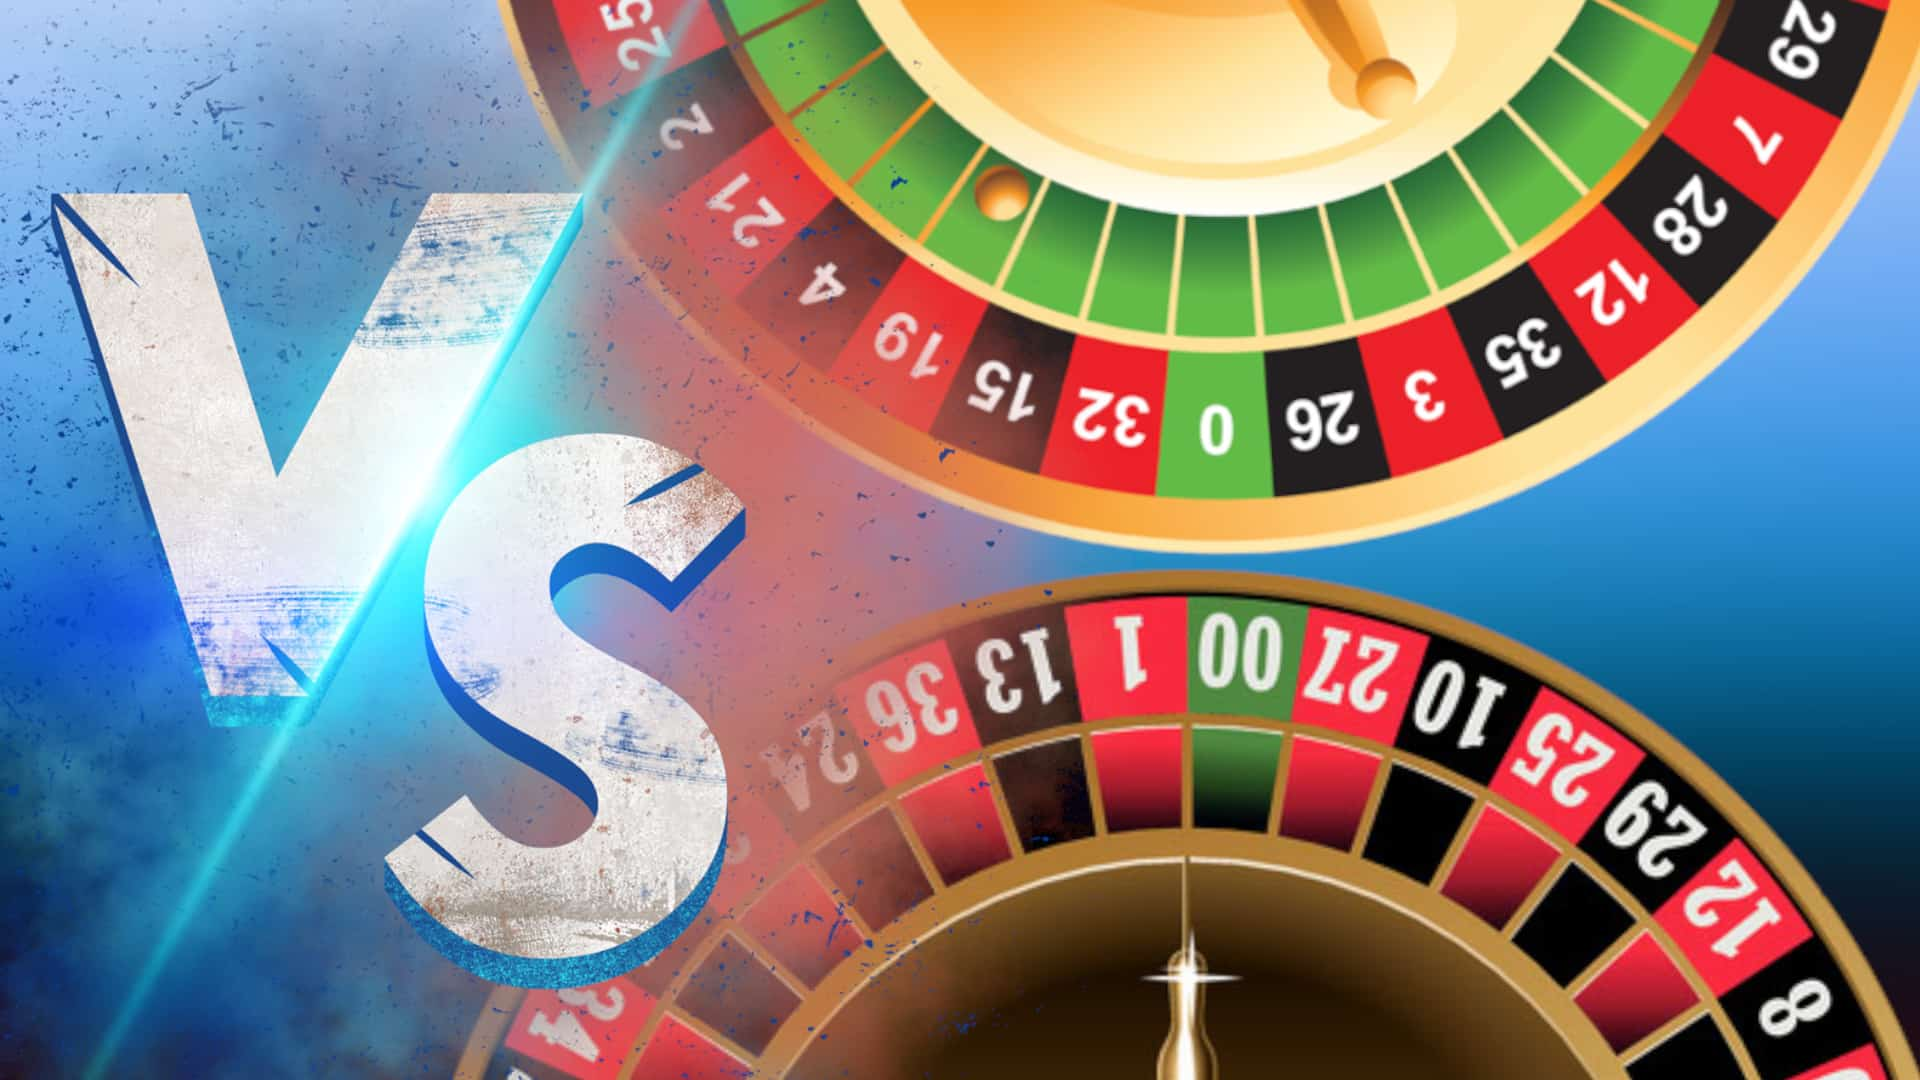 ruletasvs Tipos de ruleta de casino